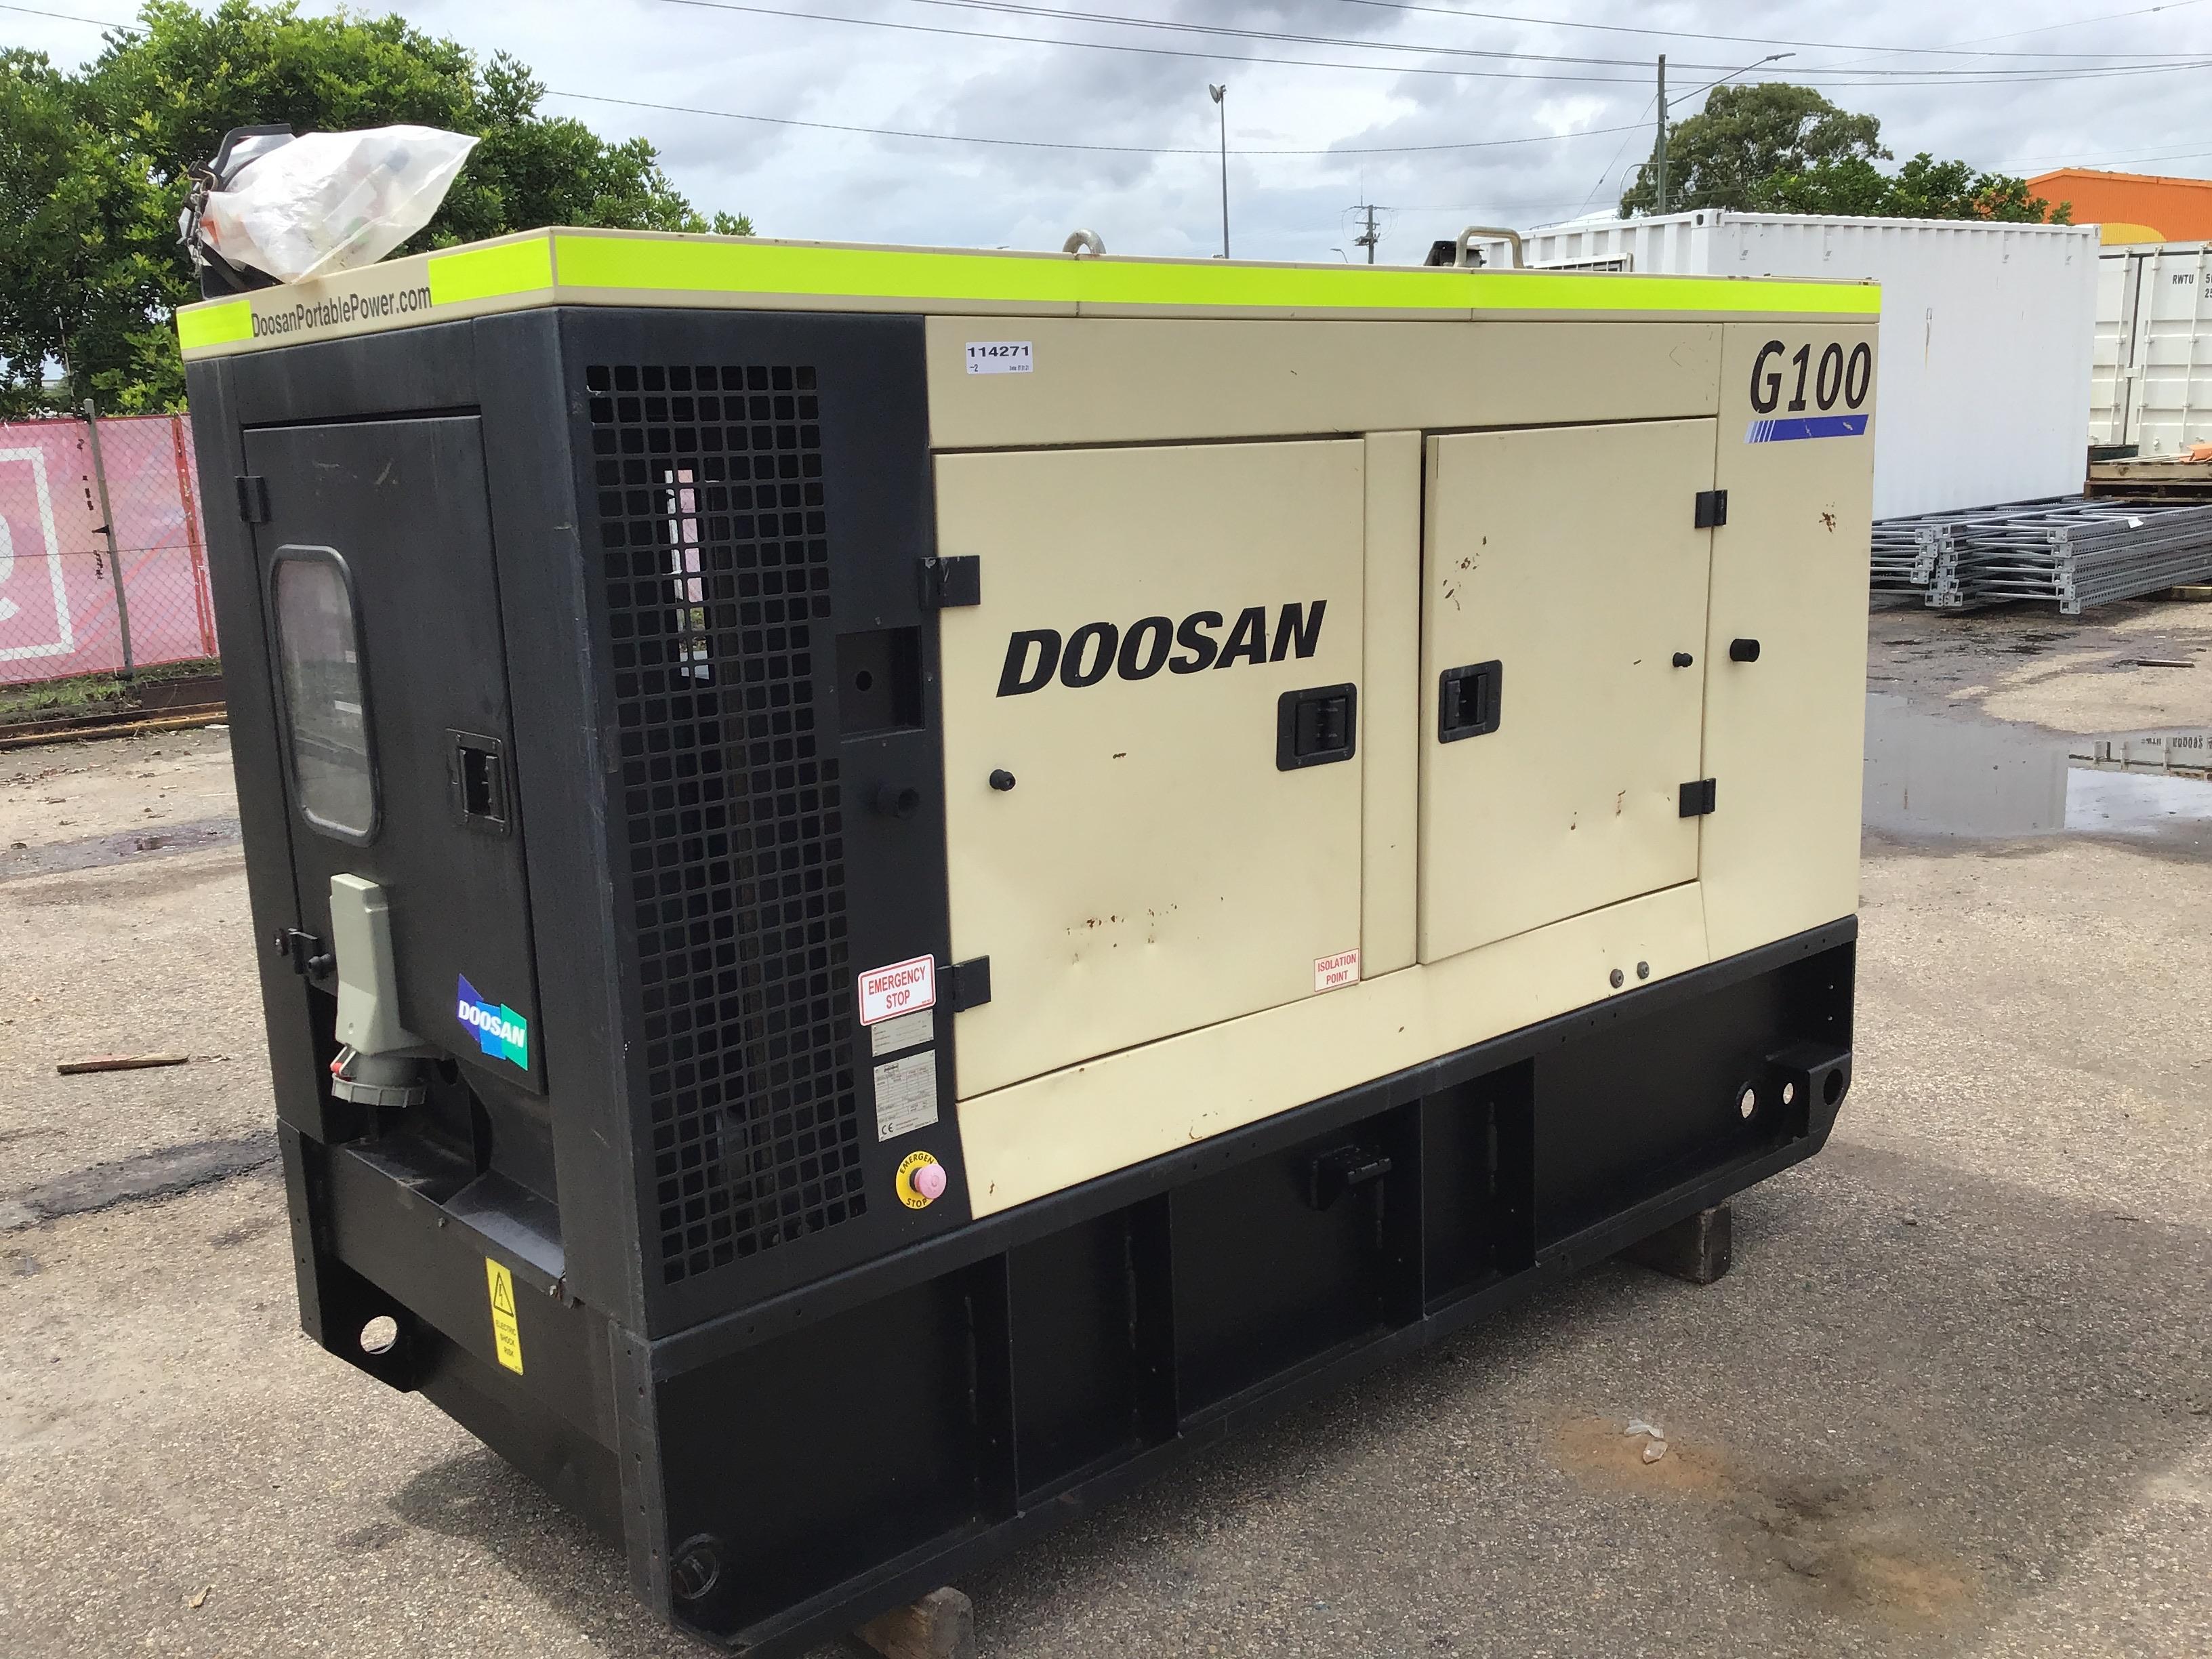 2012 Doosan Ingersoll Rand G100 100kVA Generator